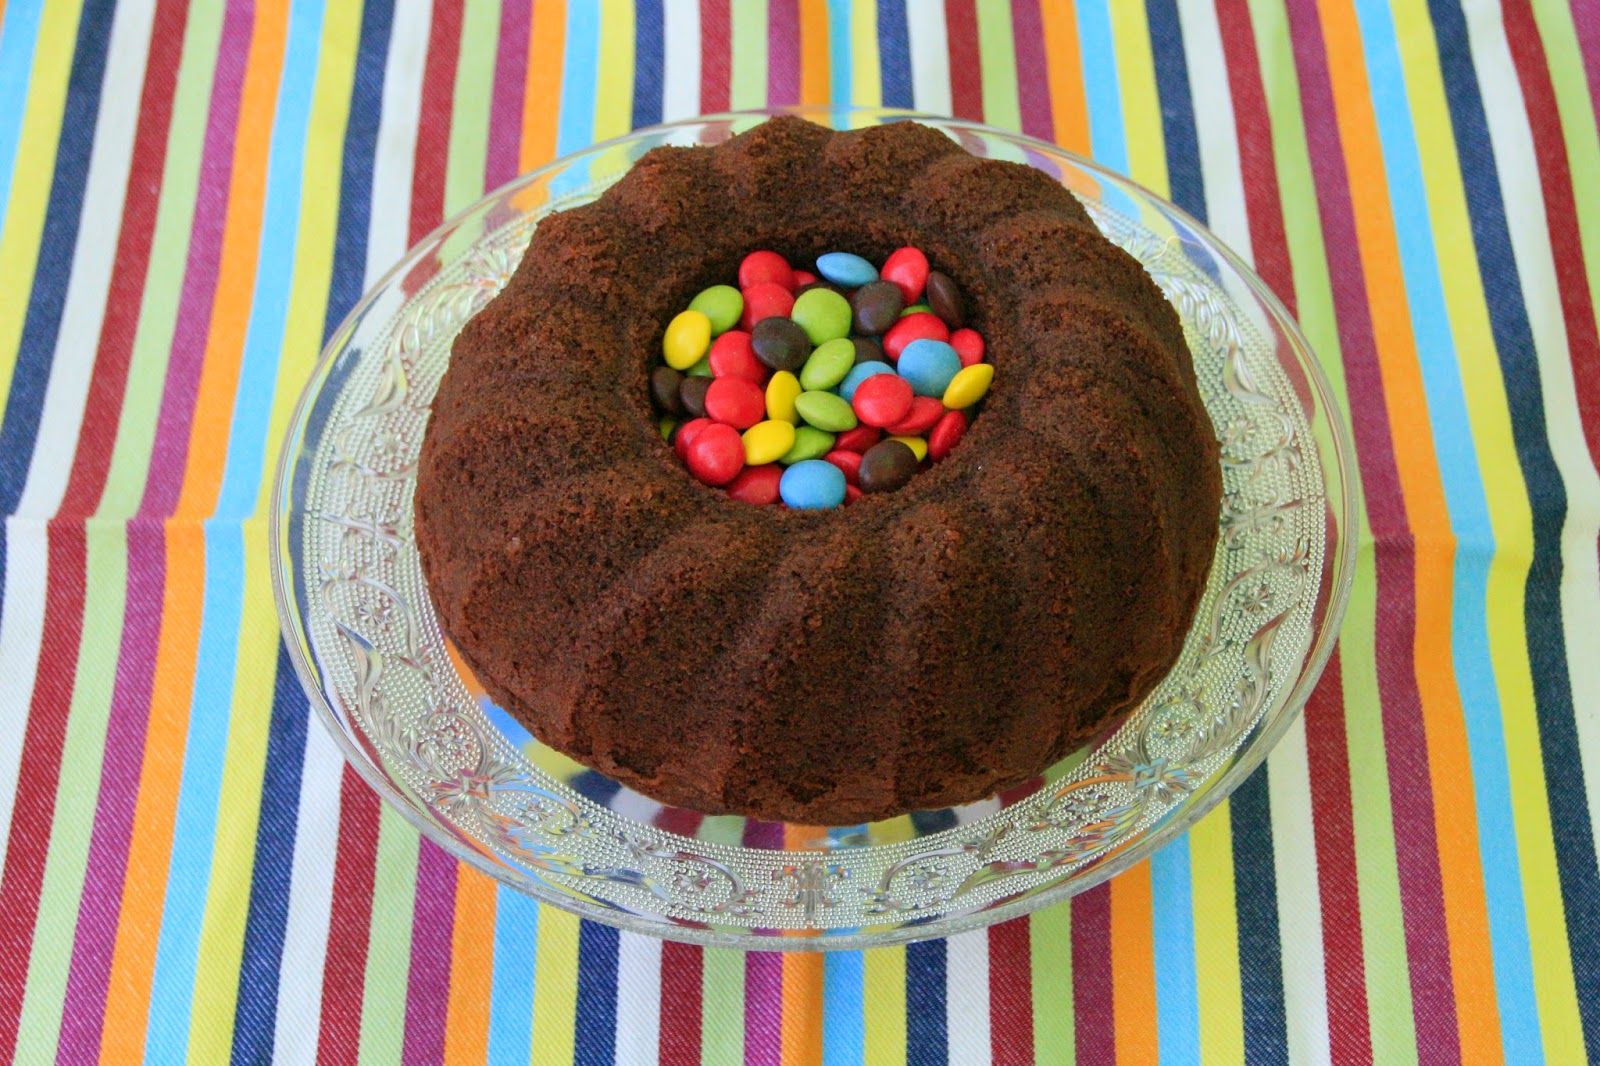 Increible bundt cake de xocolata per esmorzar